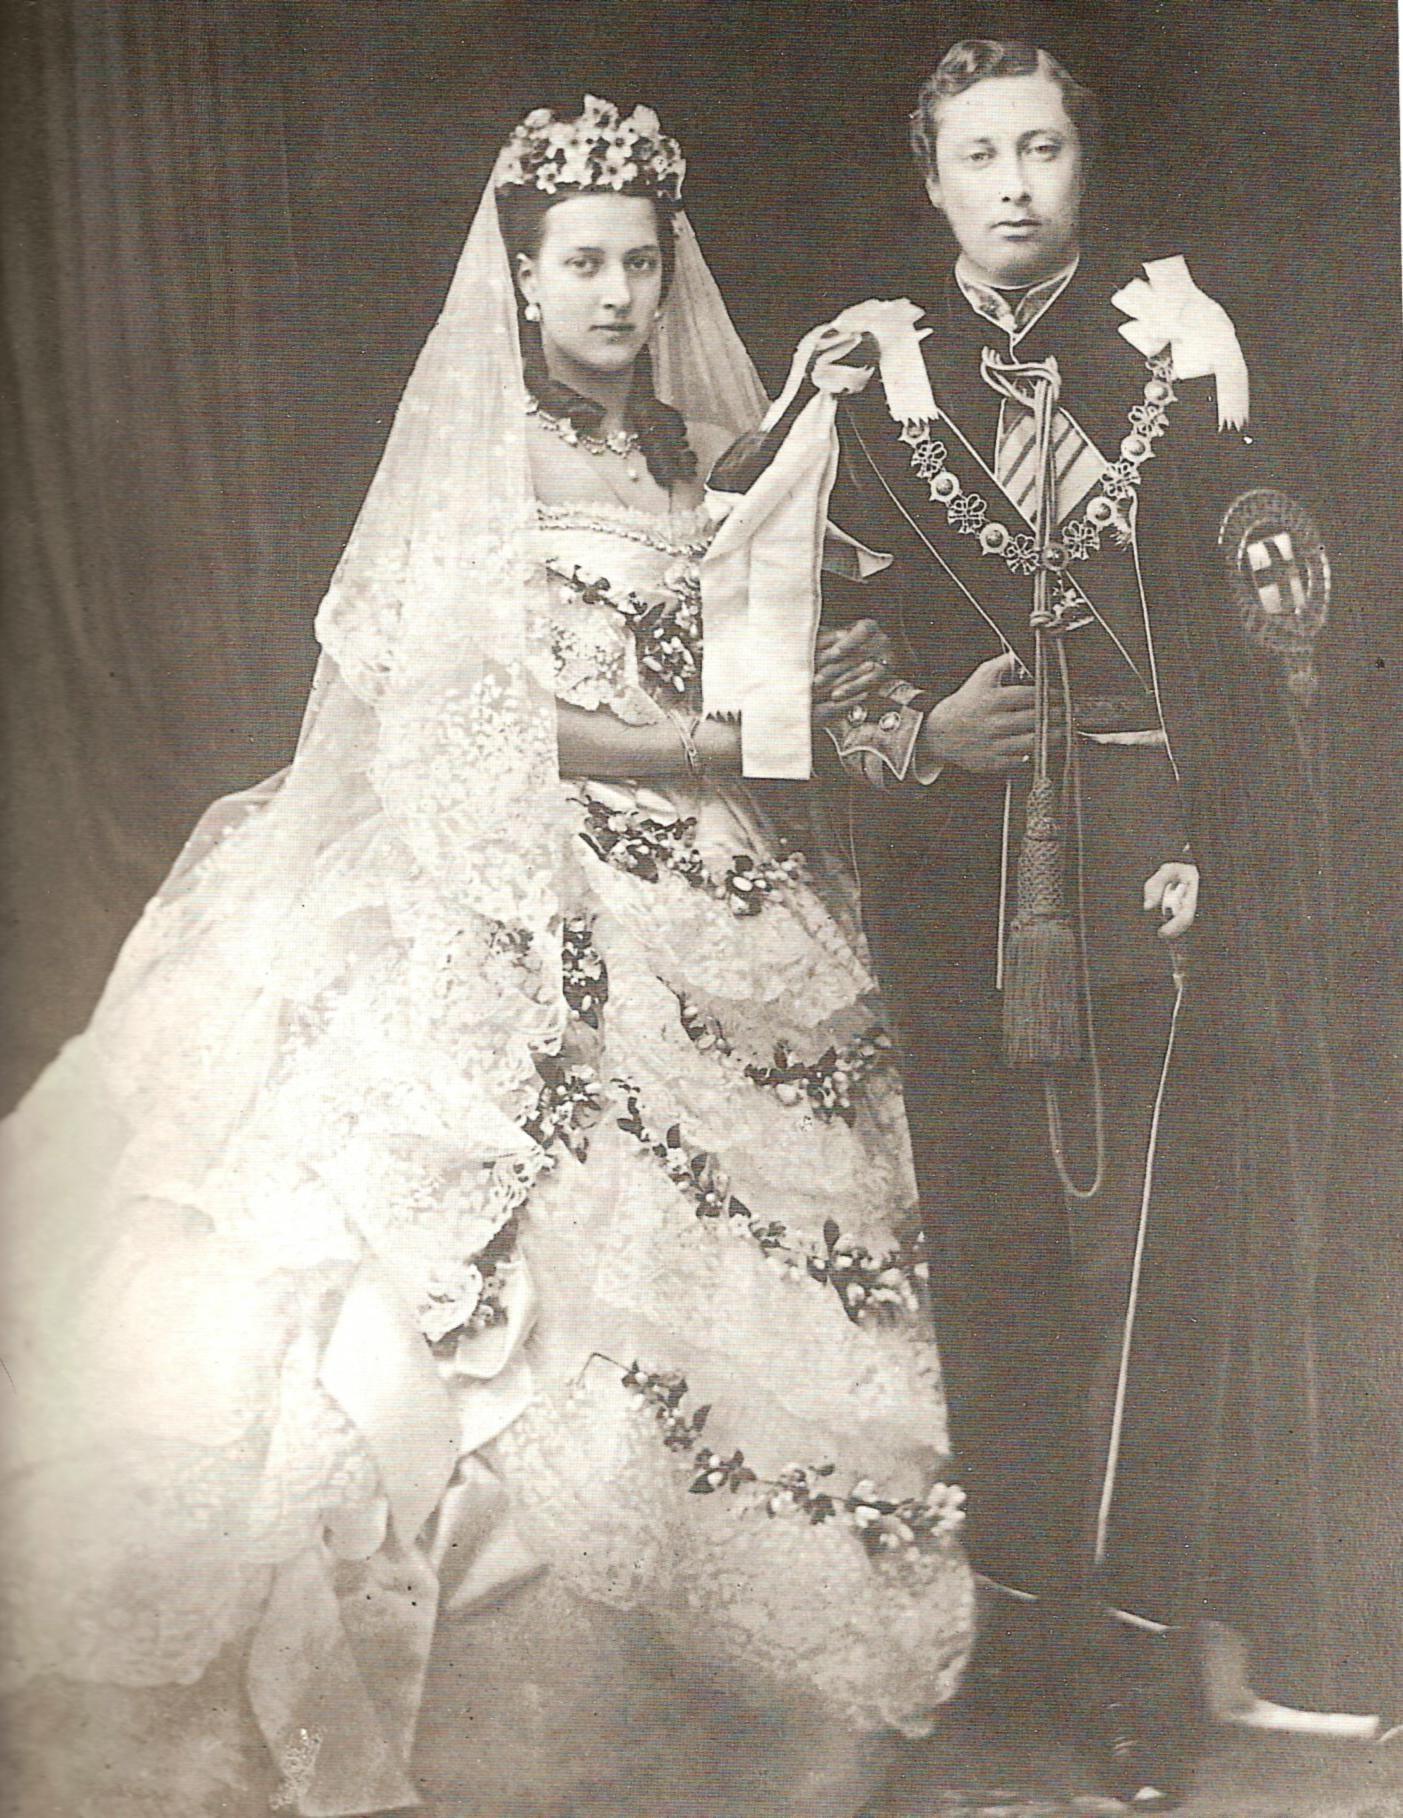 prince albert edward and princess alexandra at their